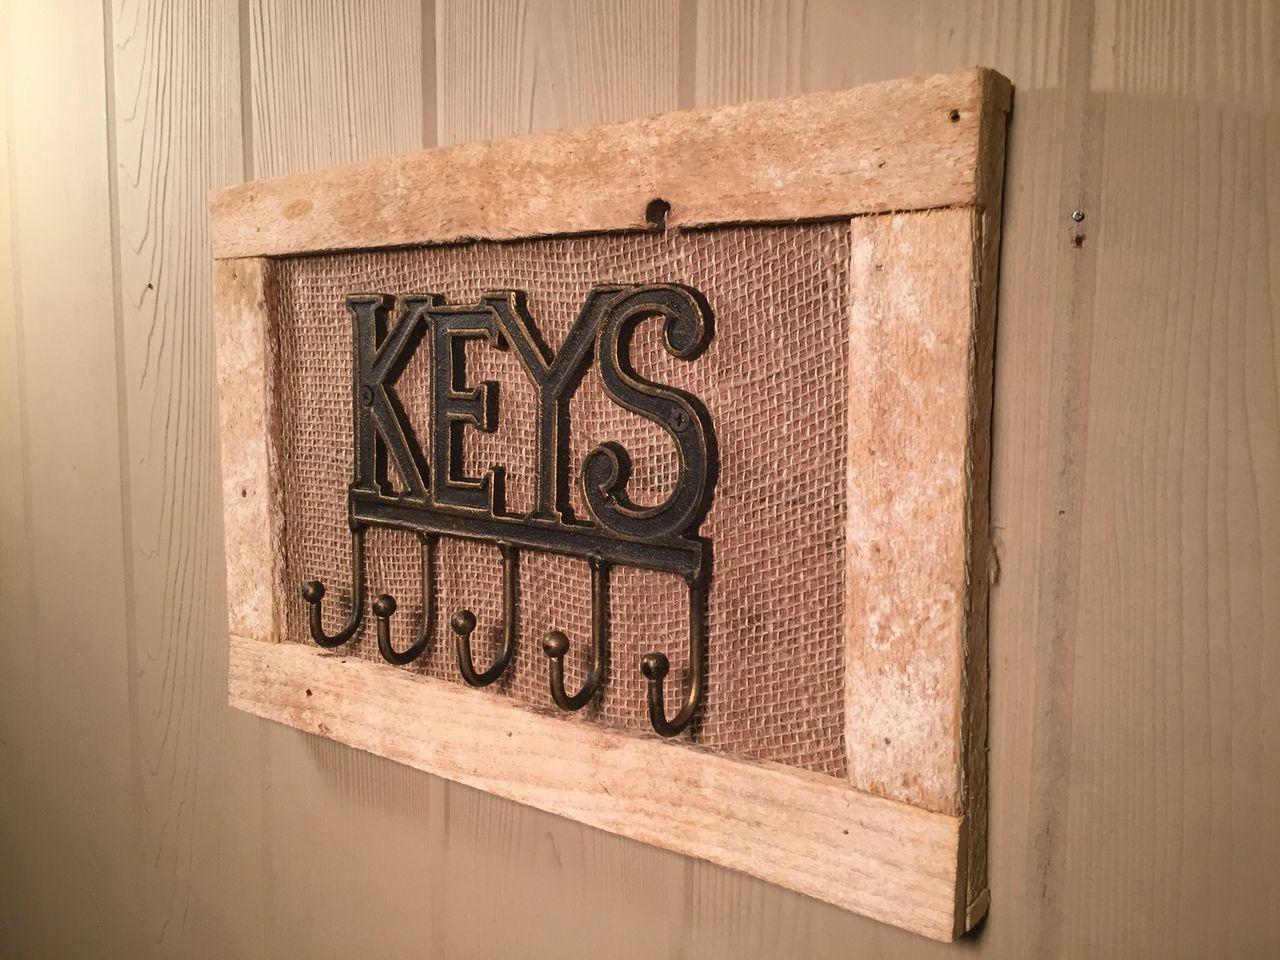 Rustic Key Holder May 2017